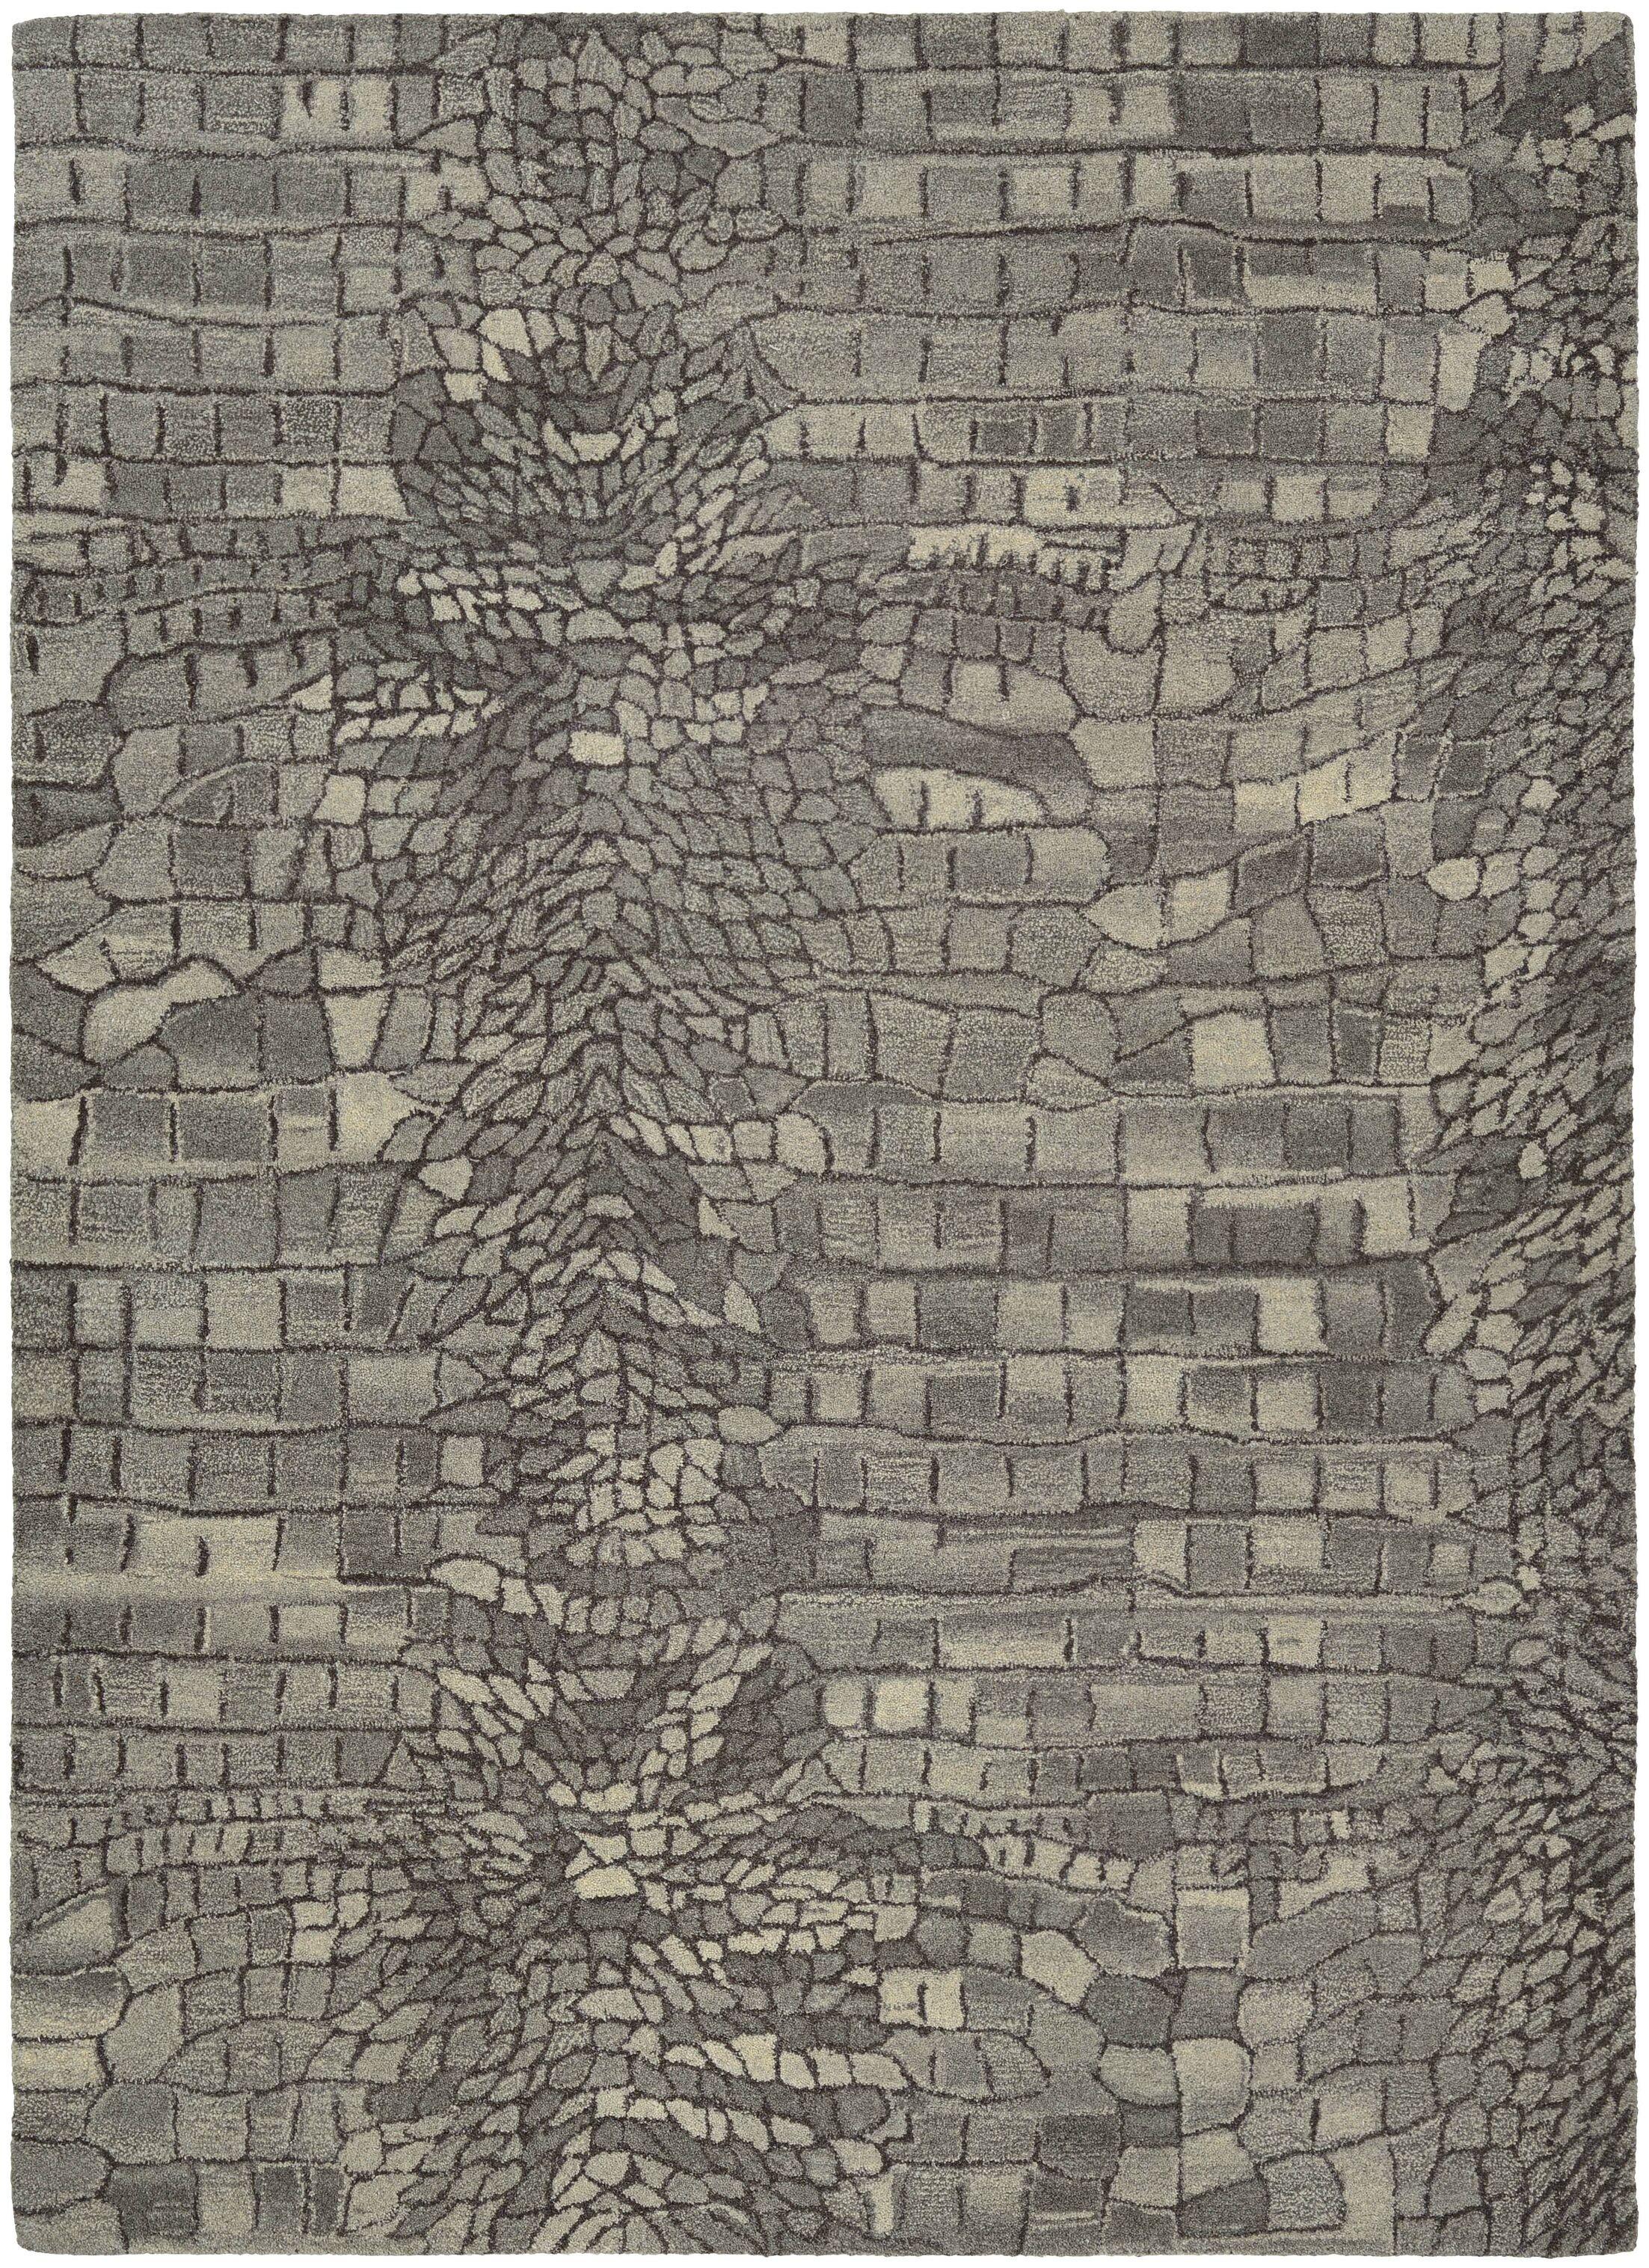 Noell Hand-Woven Wool Graystone Area Rug Rug Size: Rectangle 5'6